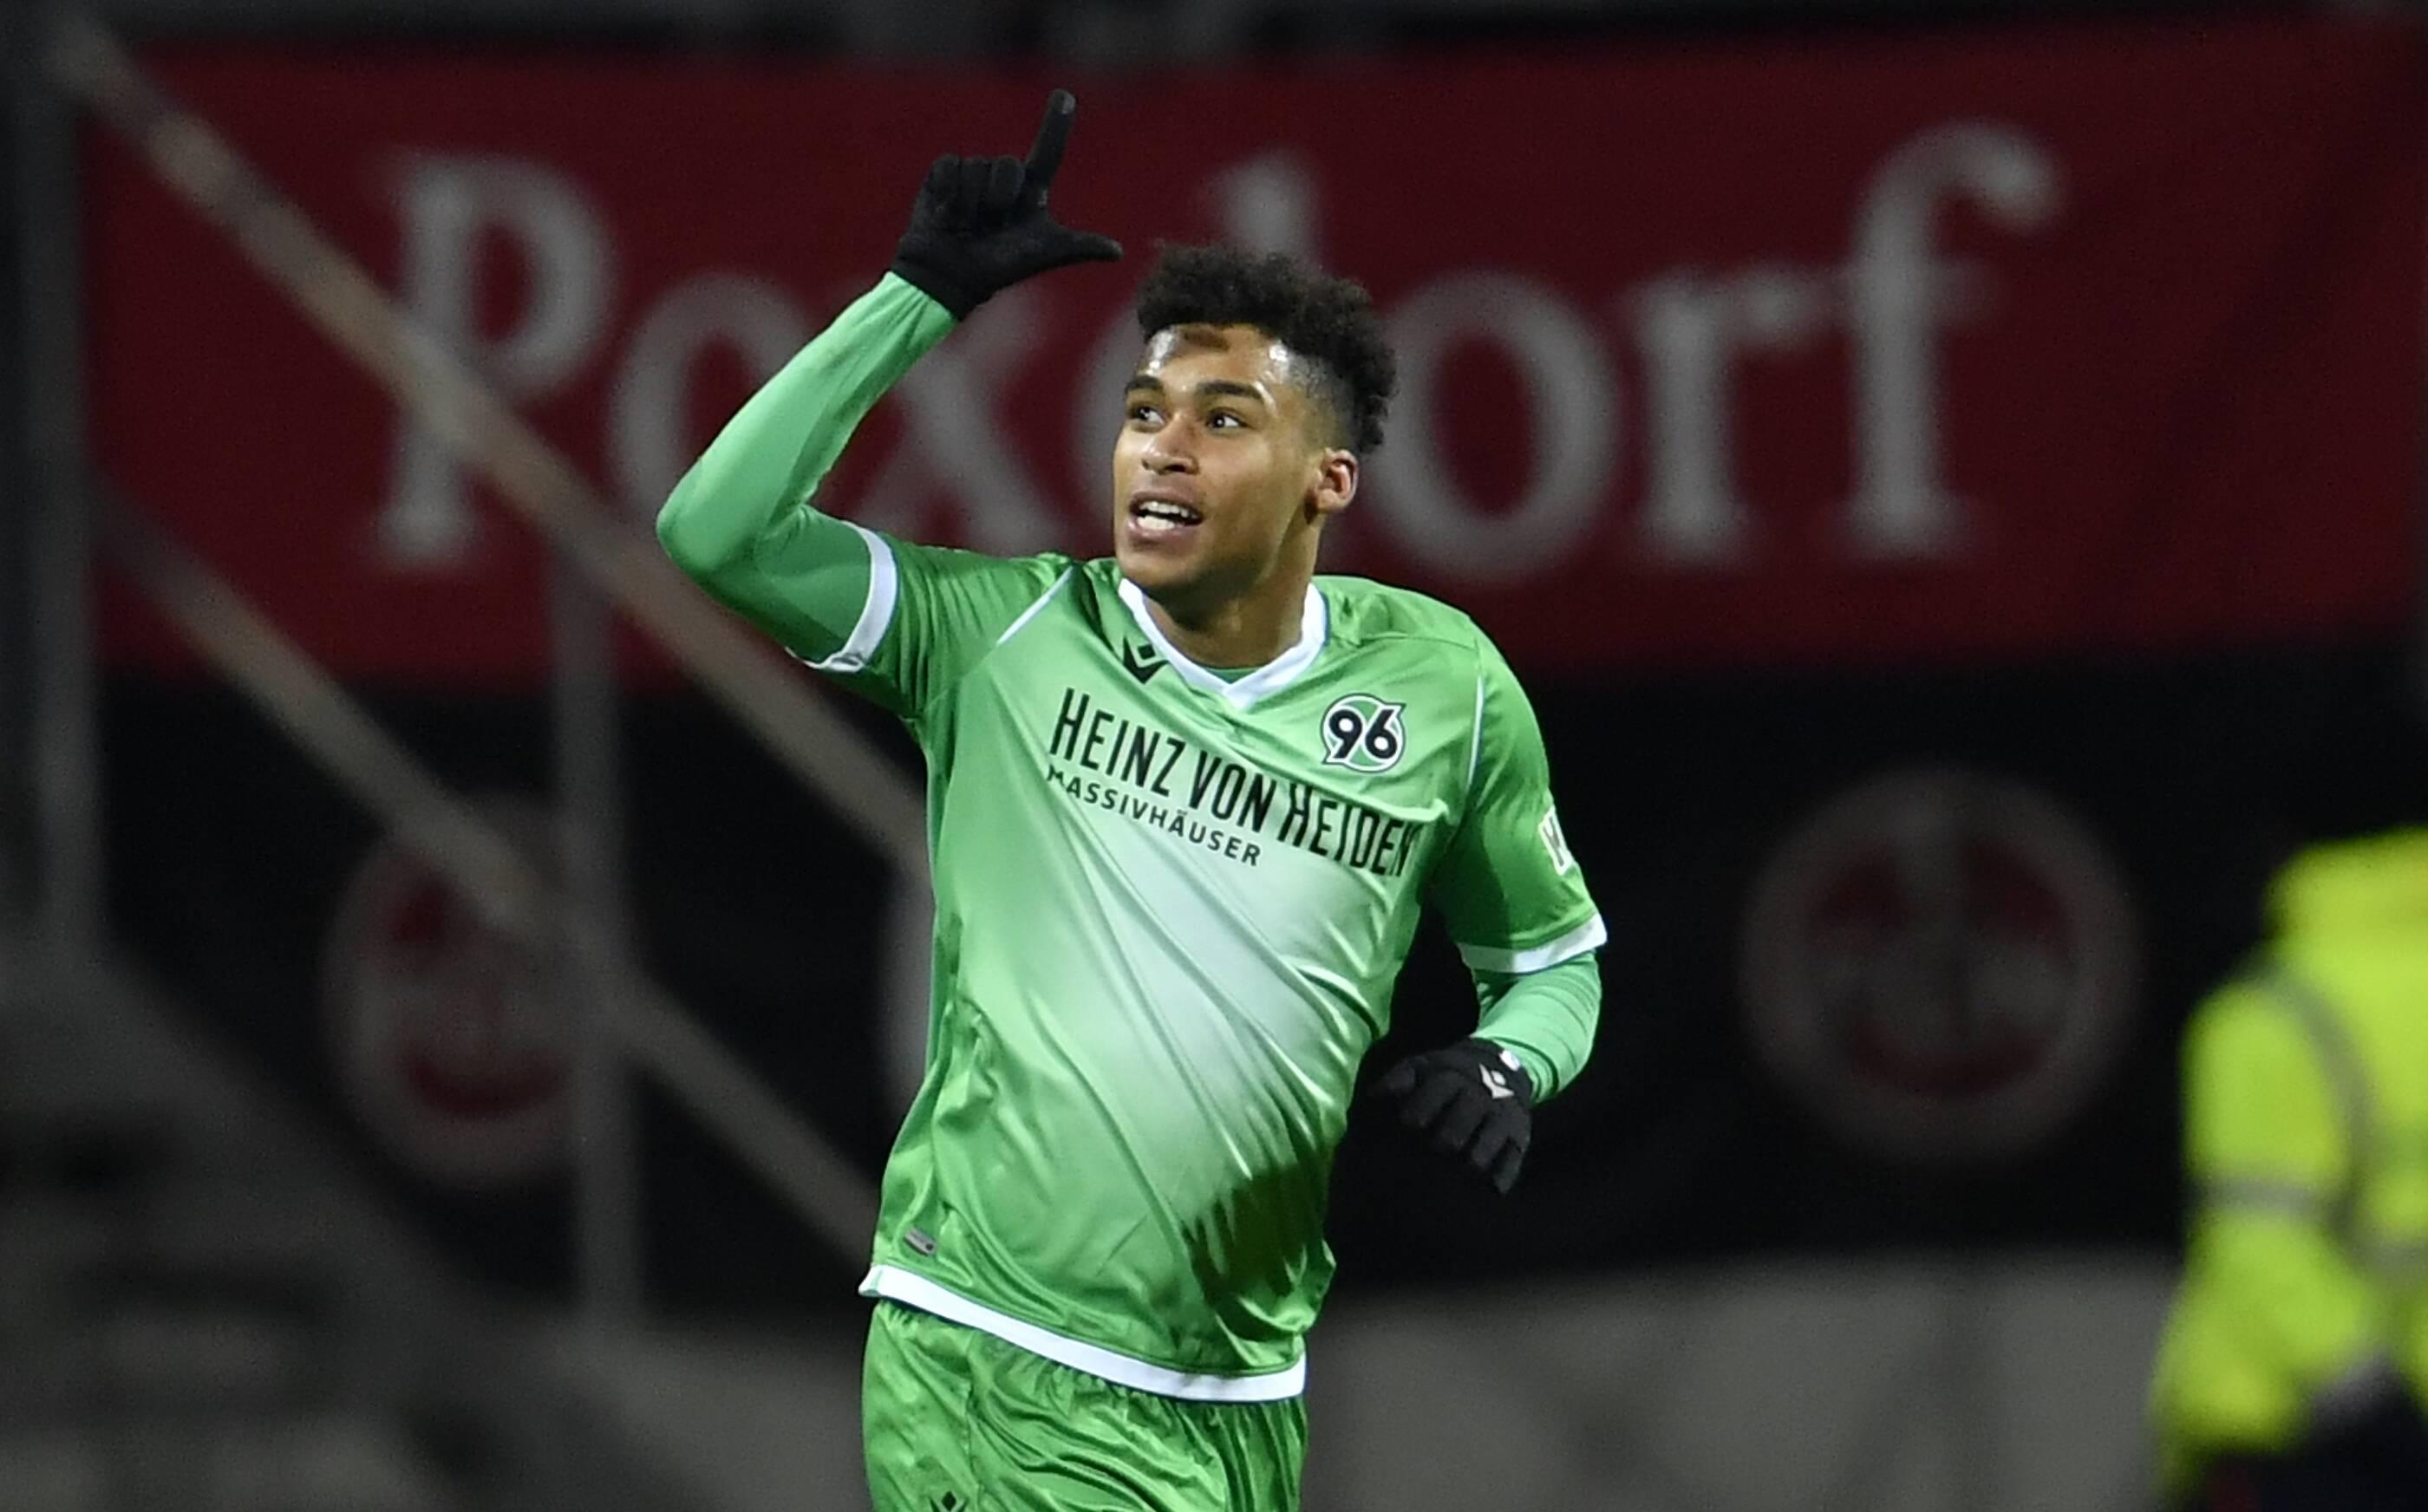 06.03.2020 – Fussball – Saison 2019 2020 – 2. Fussball – Bundesliga – 25. Spieltag: 1. FC Nürnberg Nuernberg FCN ( Club